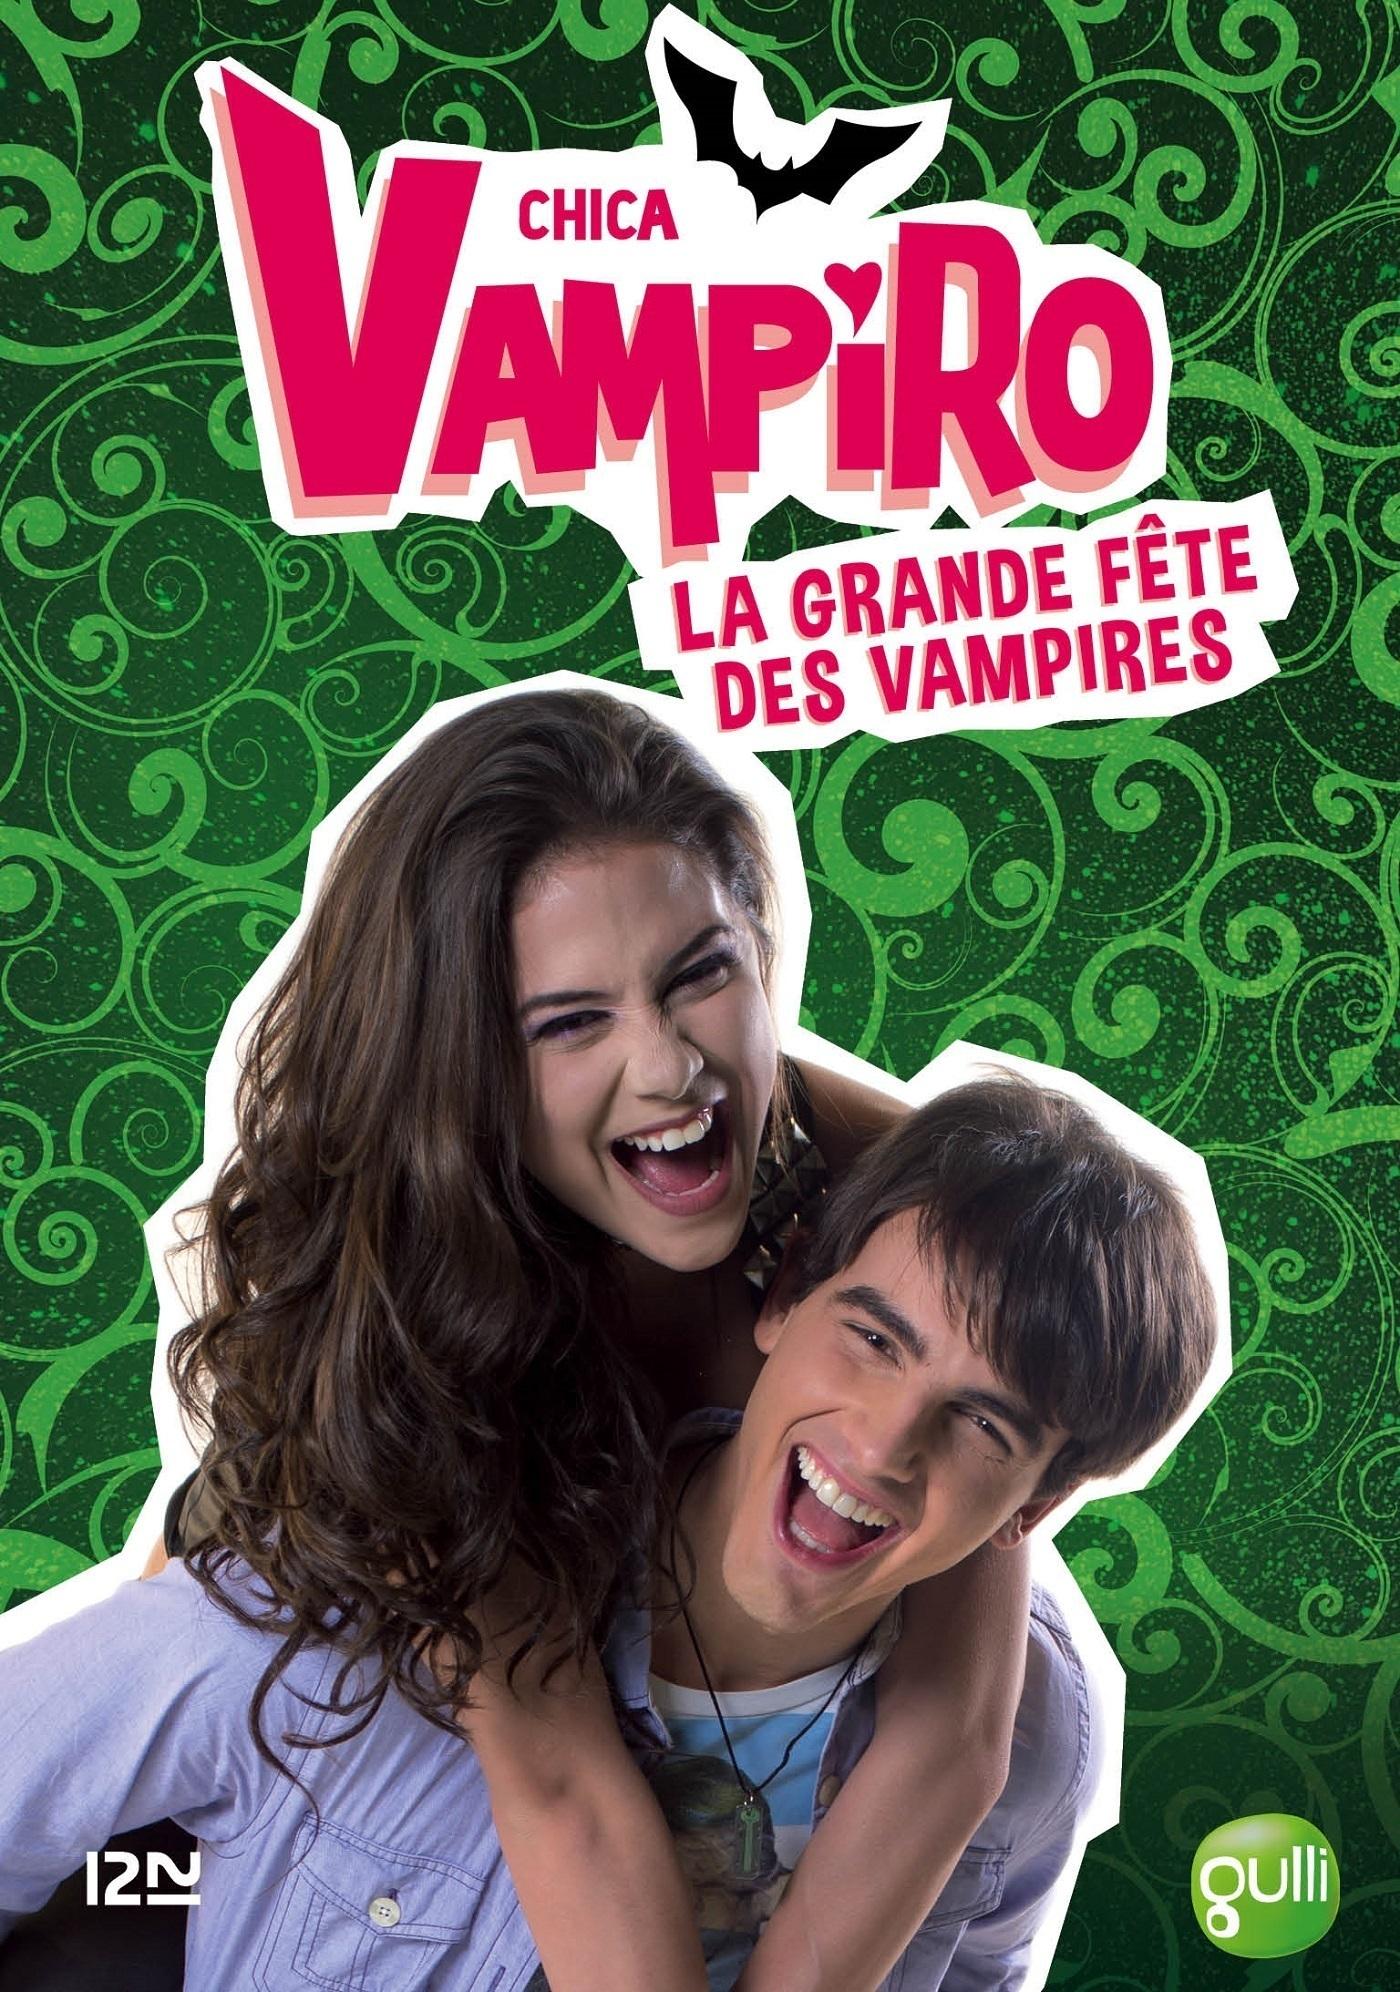 Chica Vampiro - tome 4 : La grande fête des vampires